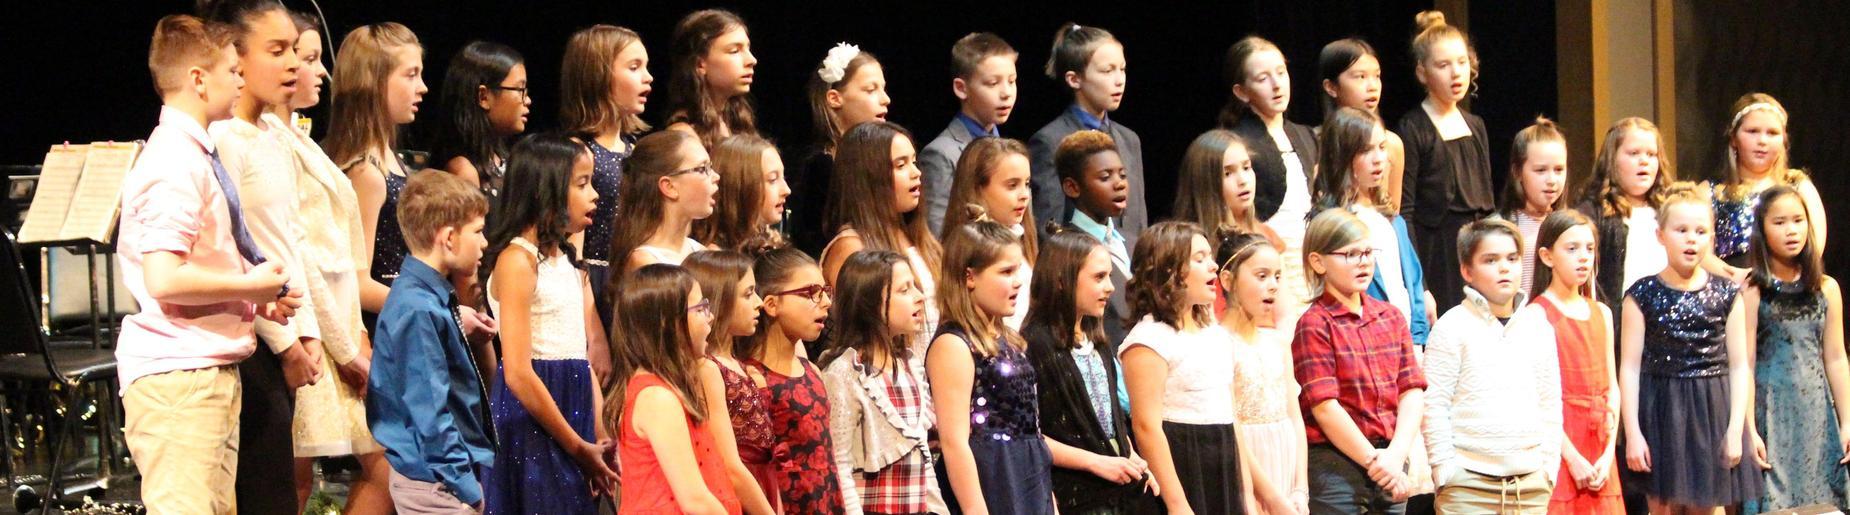 5th grade chorus at Richard Mann Elementary